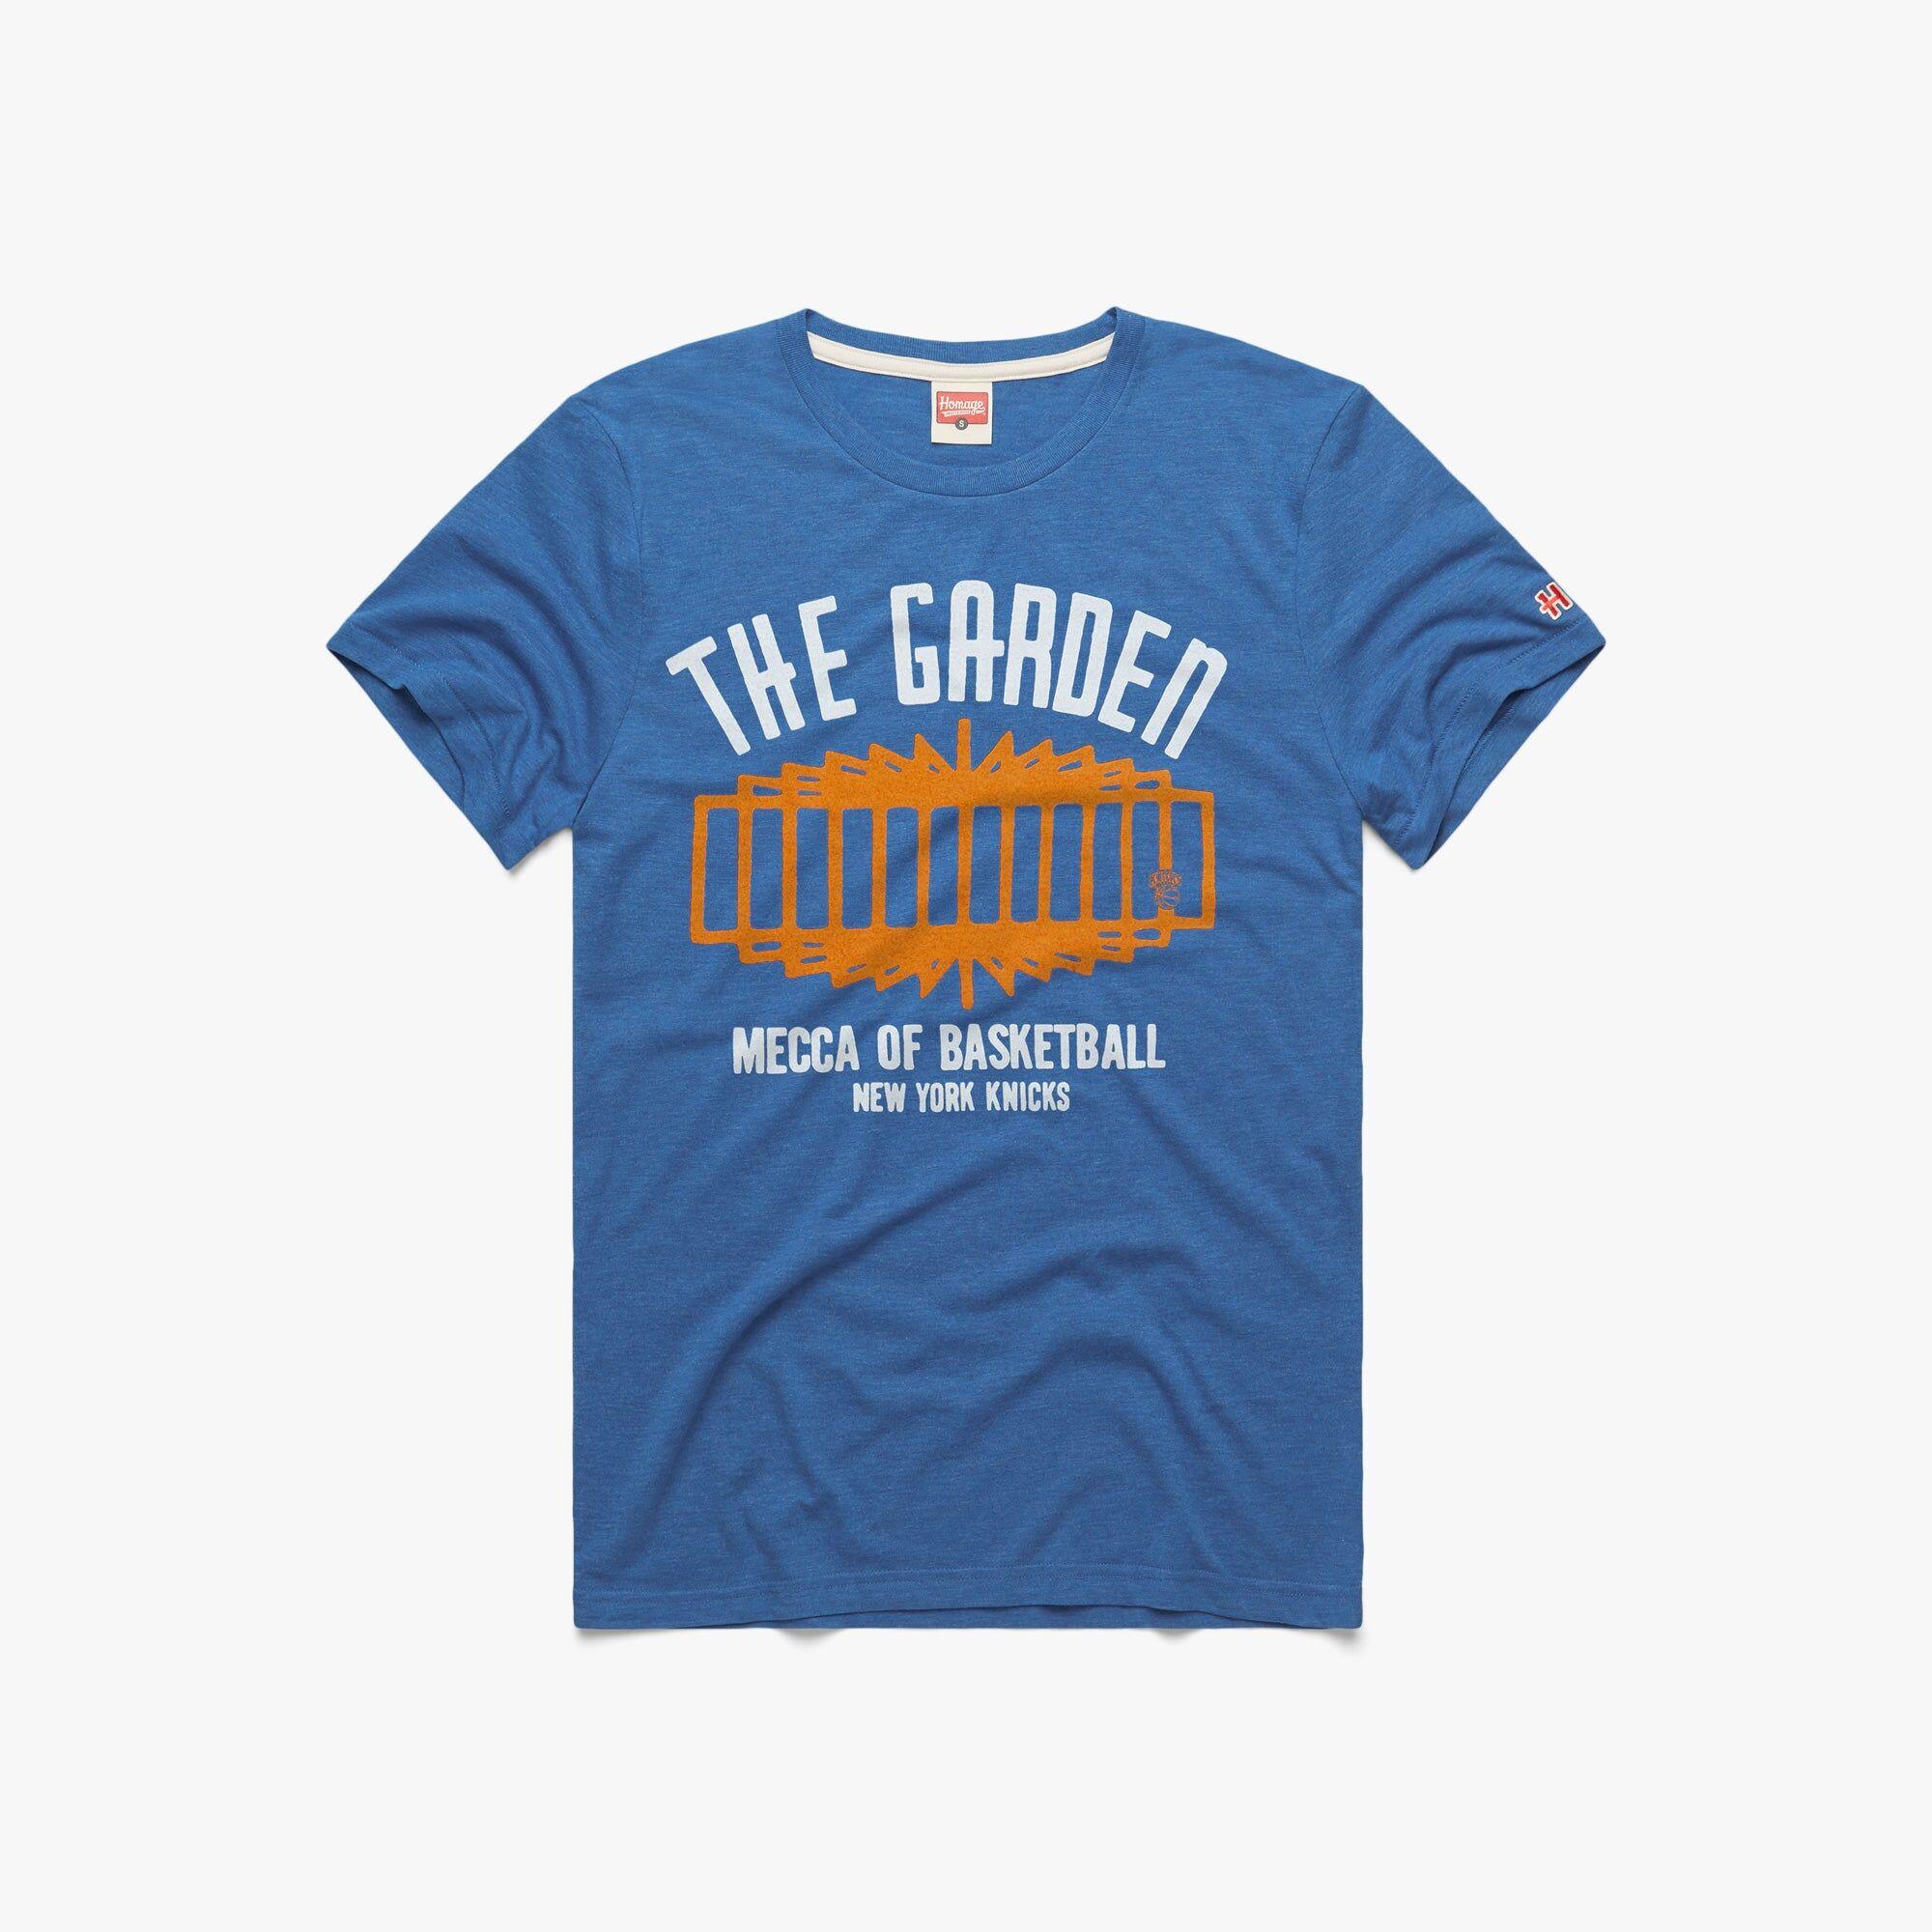 HOMAGE New York Knicks The Garden in  Blue (Size: XL)